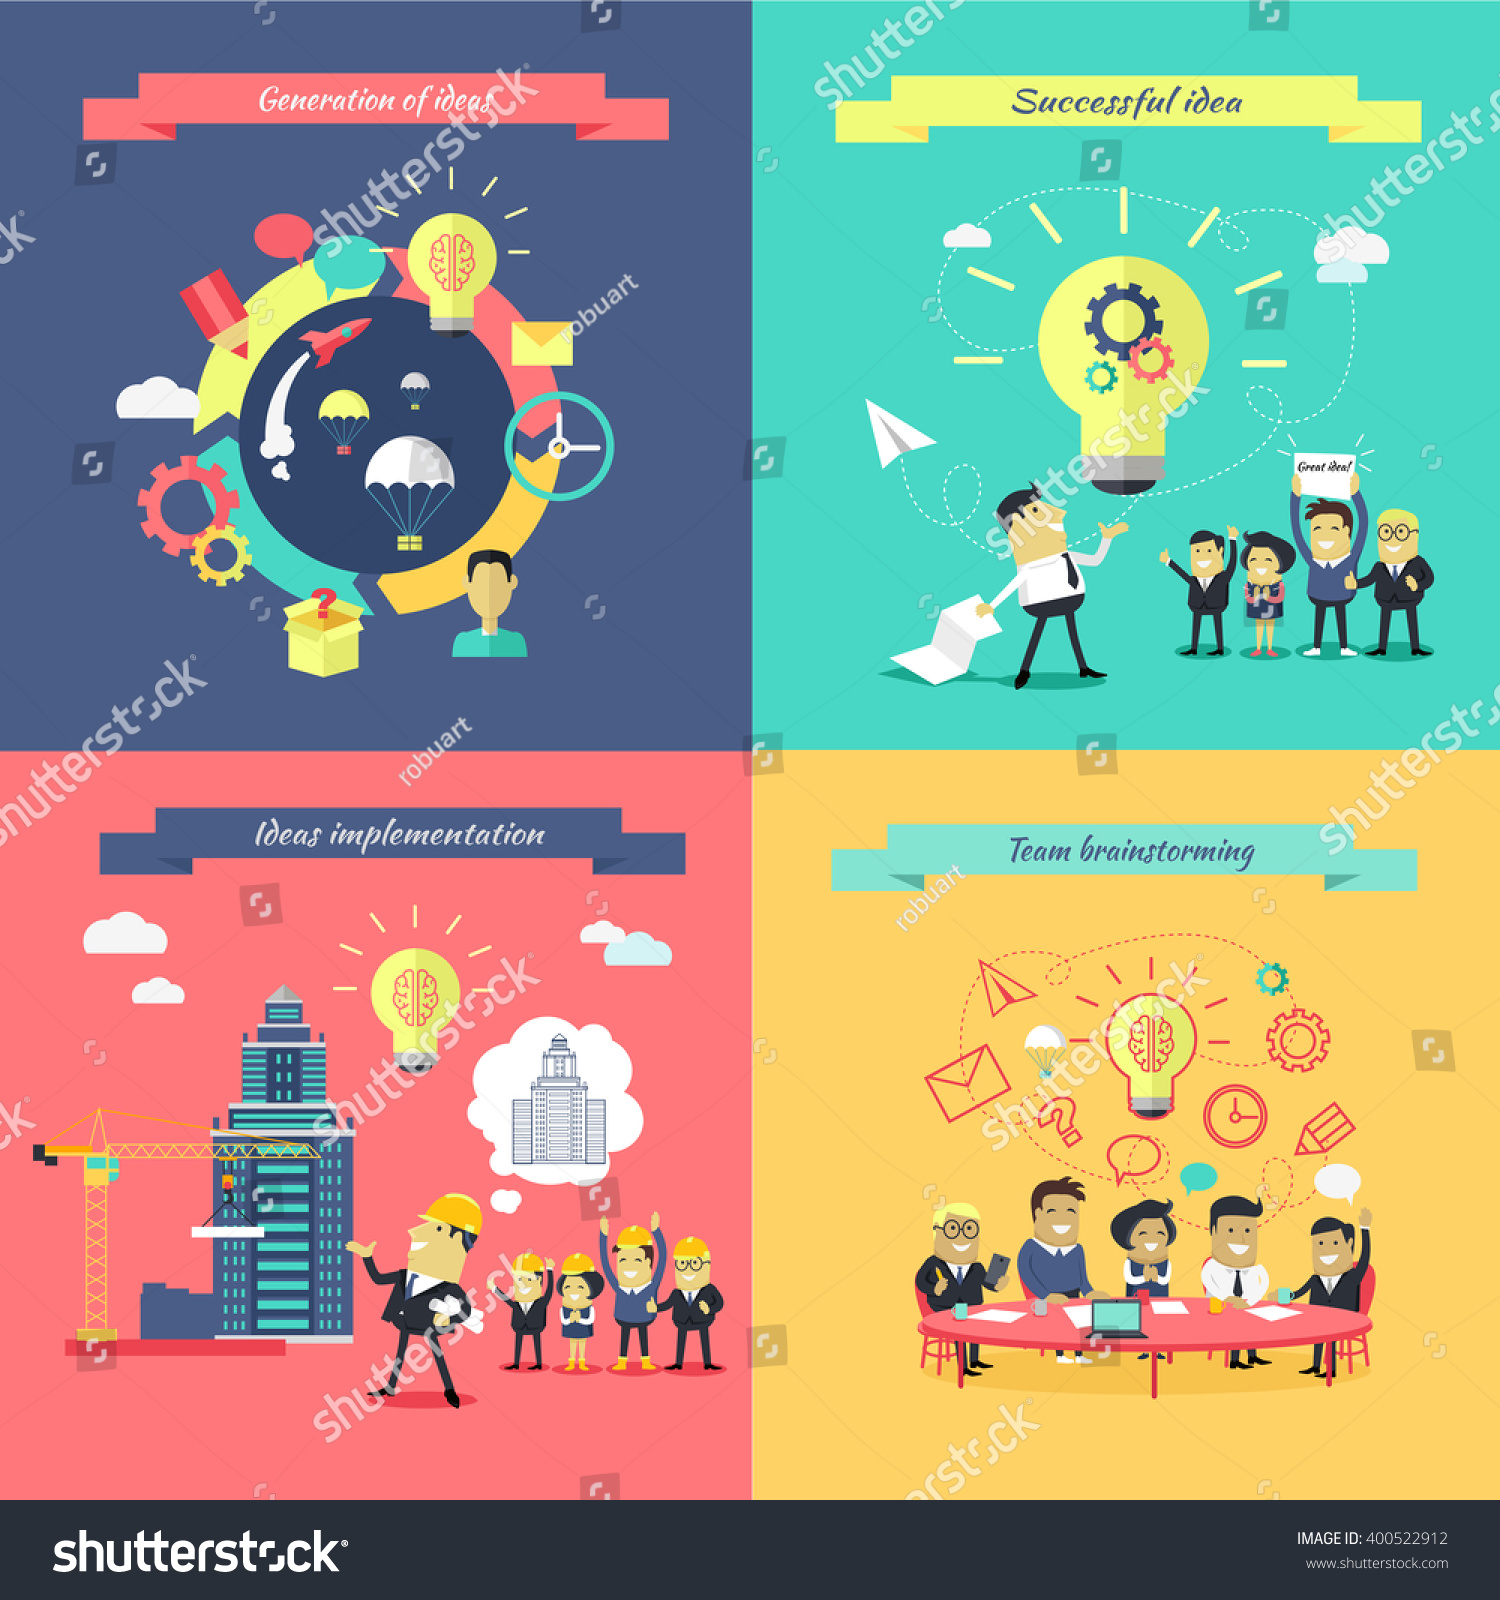 generation ideas banners set brainstorming team stock vector